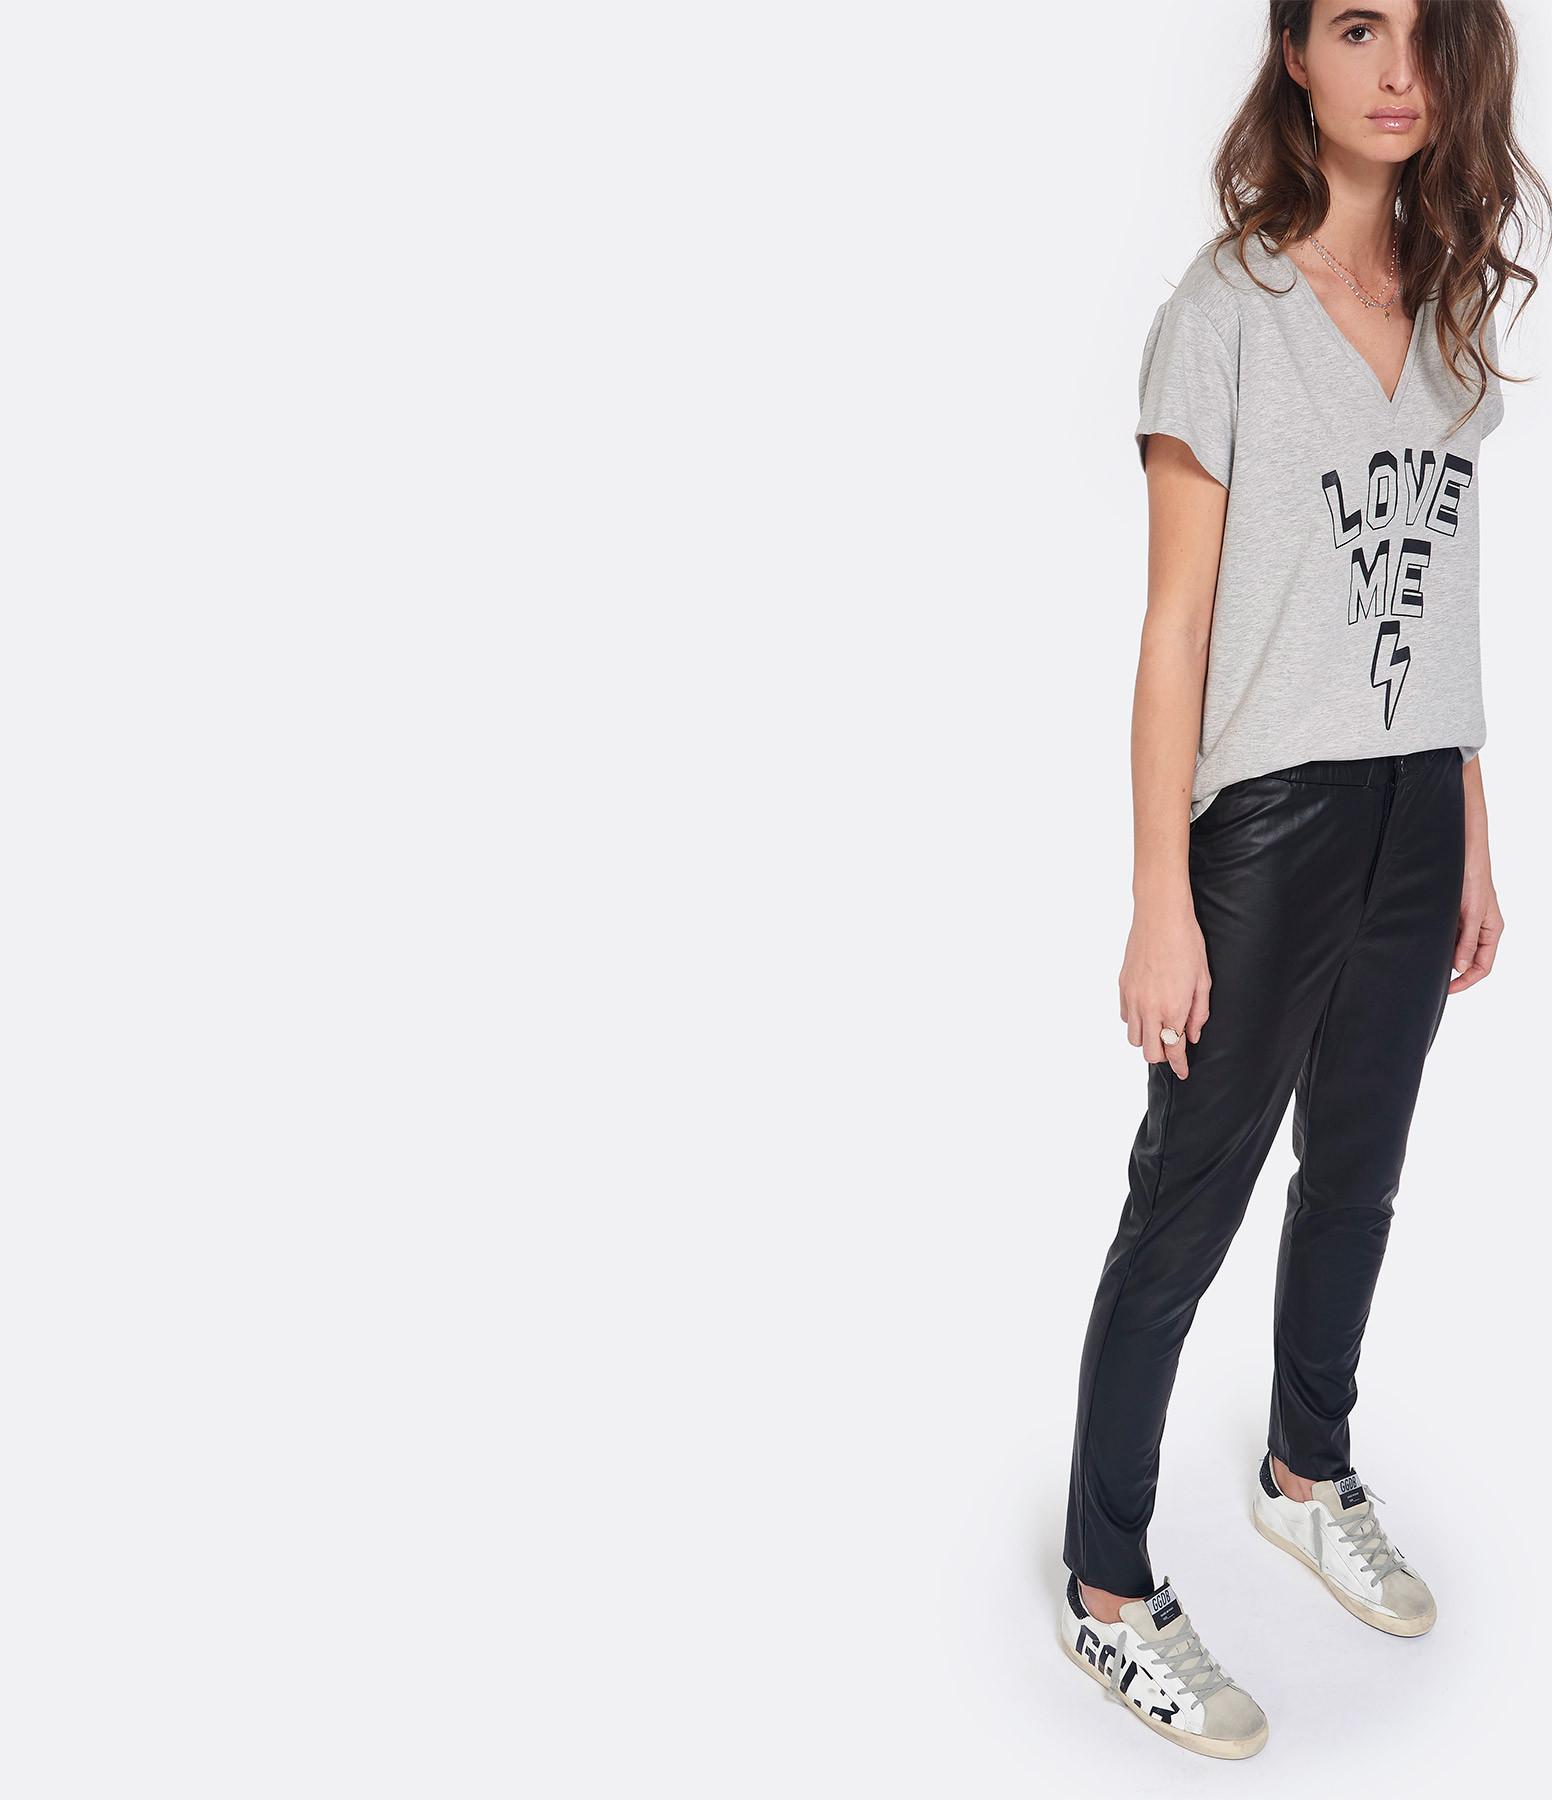 JEANNE VOULAND - Pantalon Cami Simili Cuir Noir